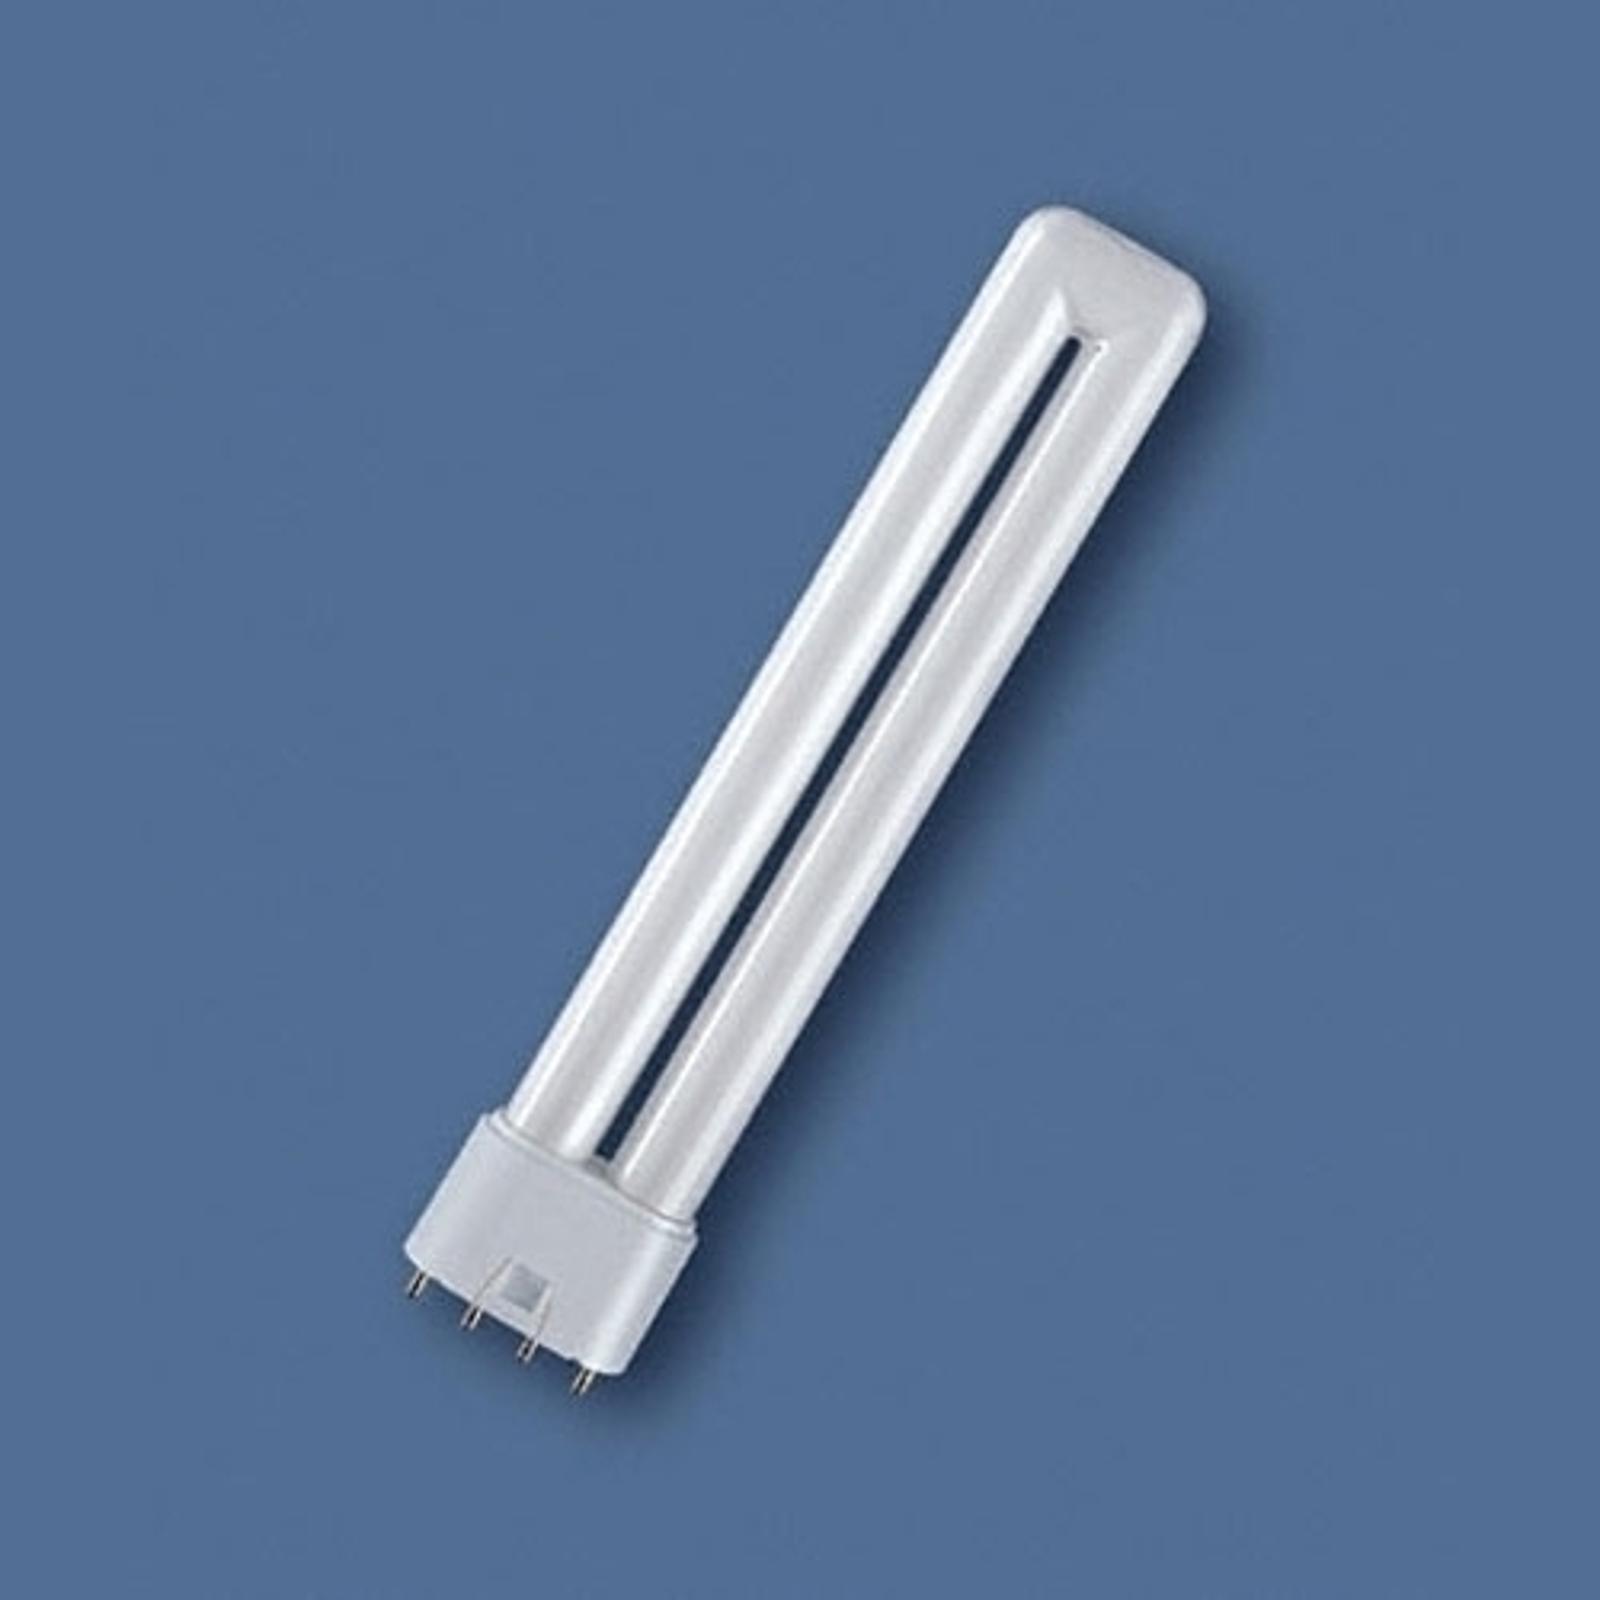 2G11 40W 830 Dulux L -pienloistelamppu